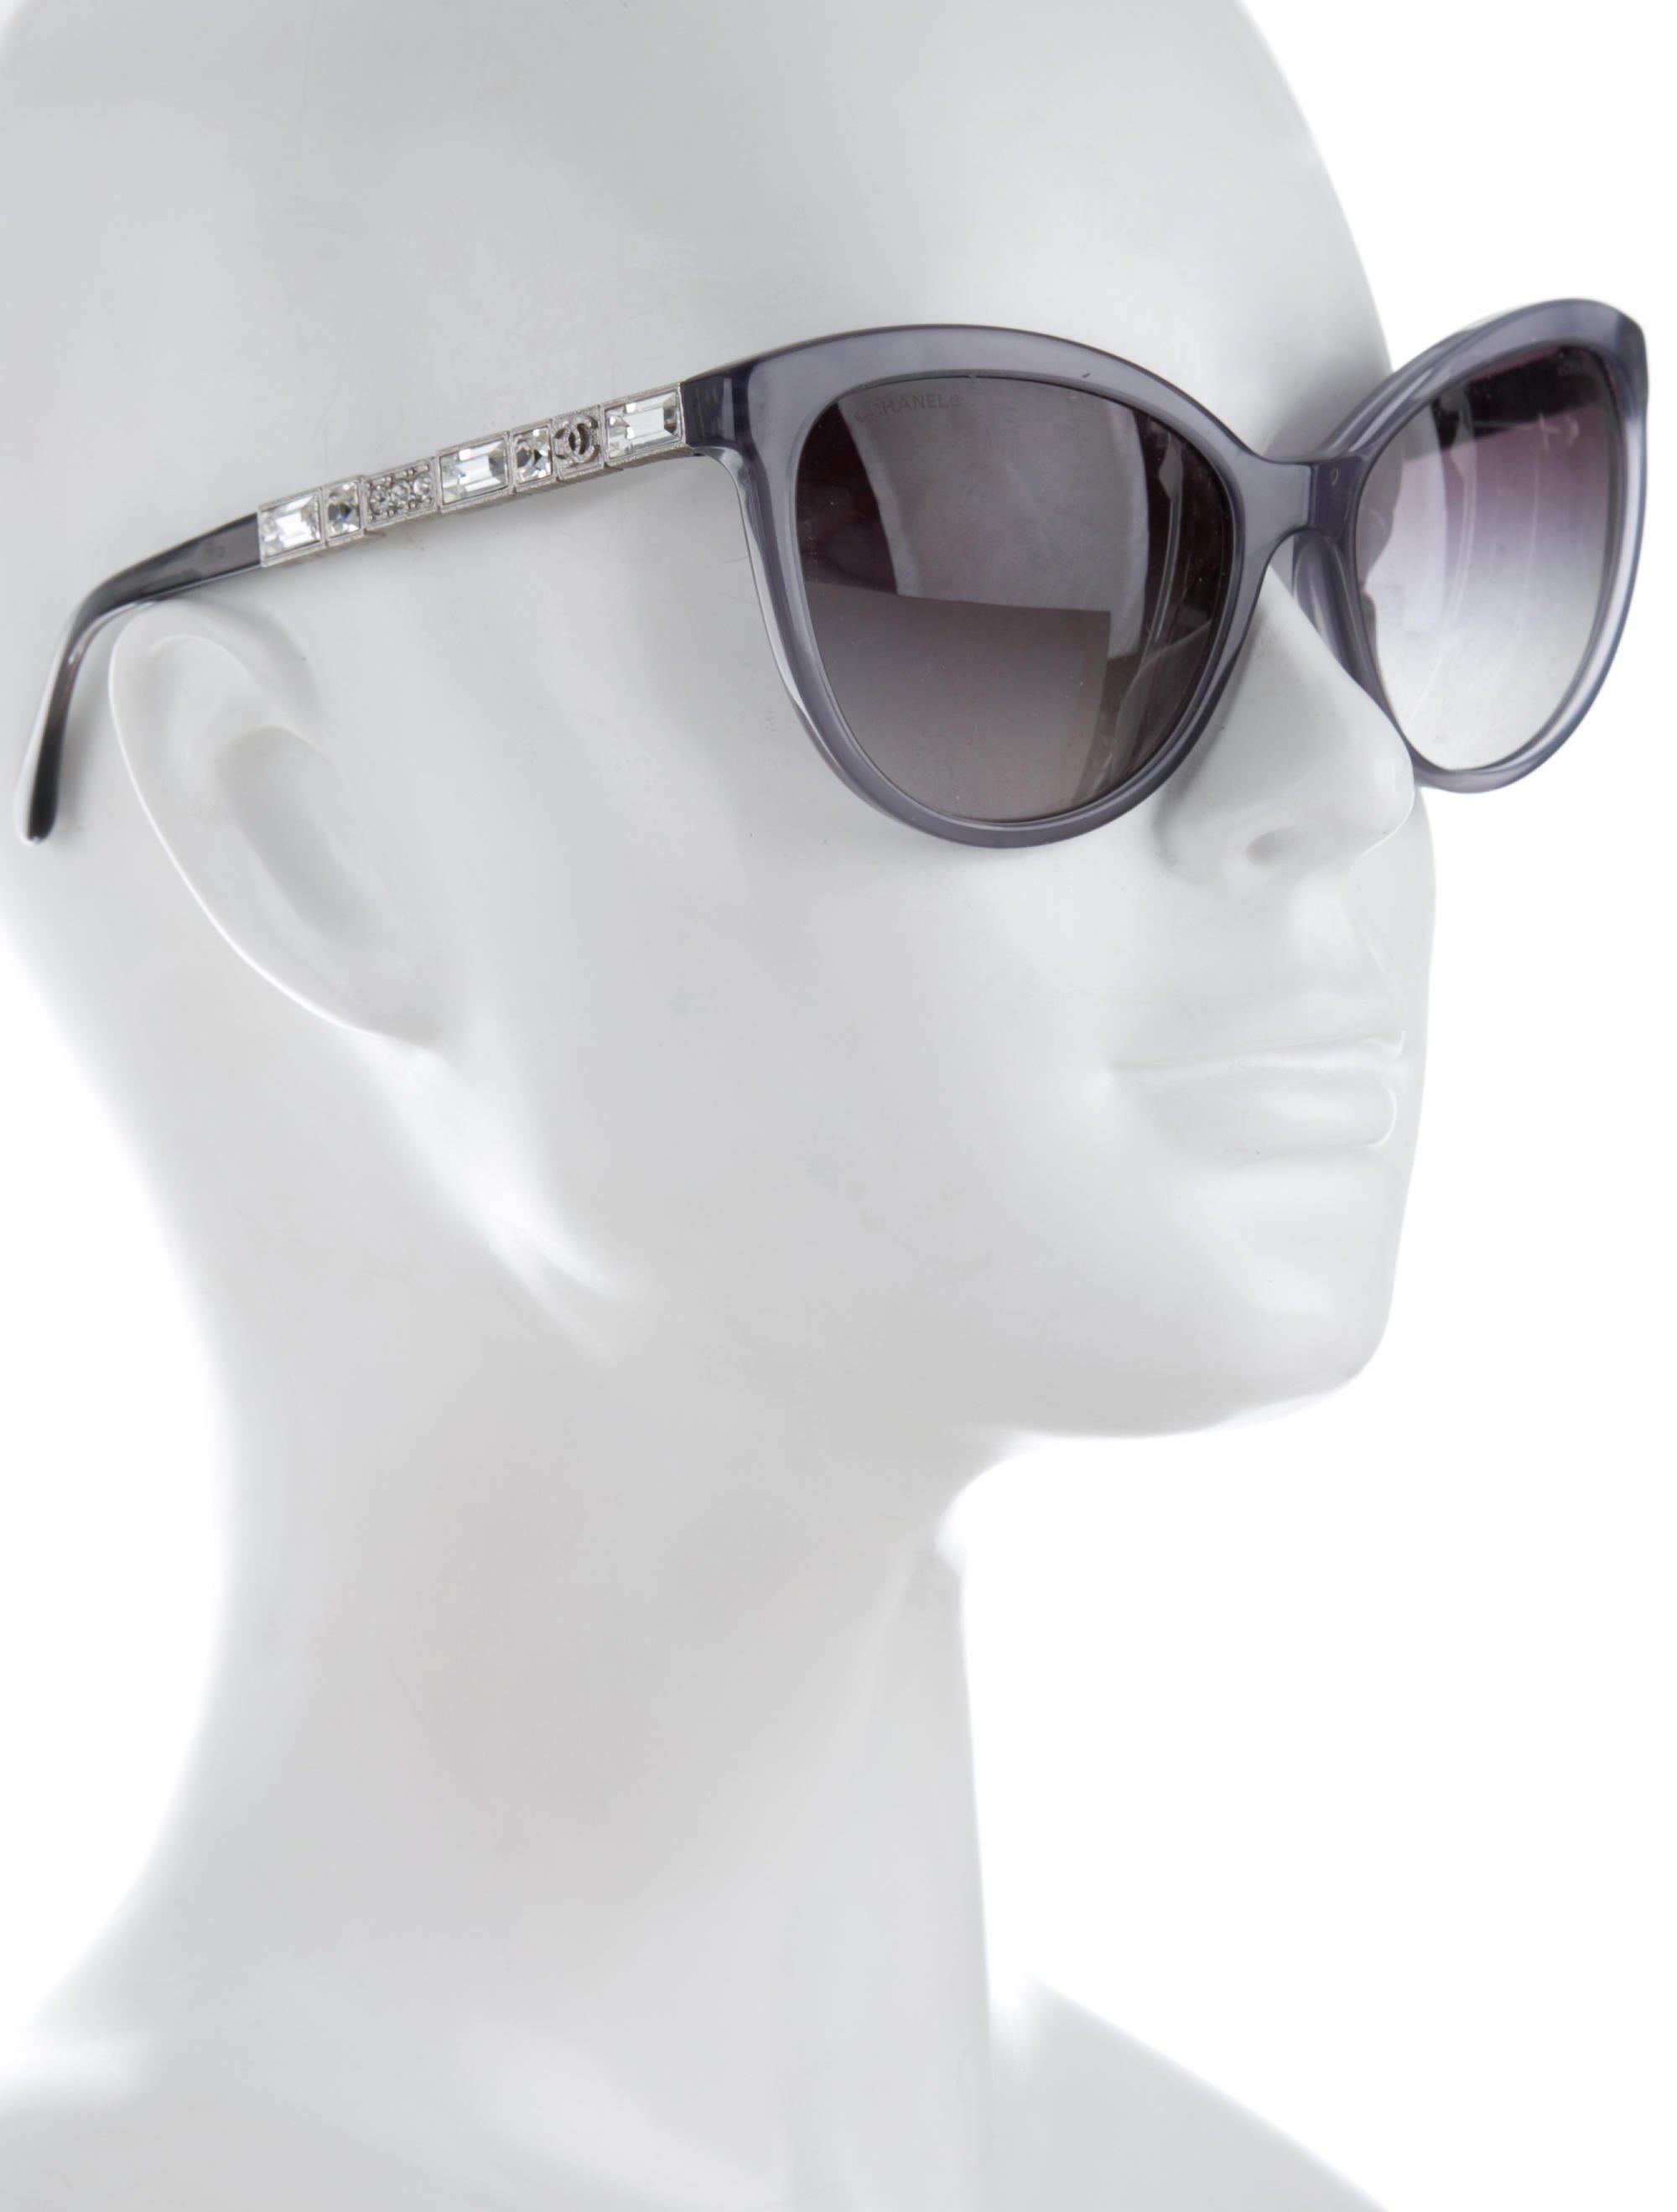 dcf33c7e65 Lyst - Chanel Bijou Cat-eye Sunglasses Grey in Gray